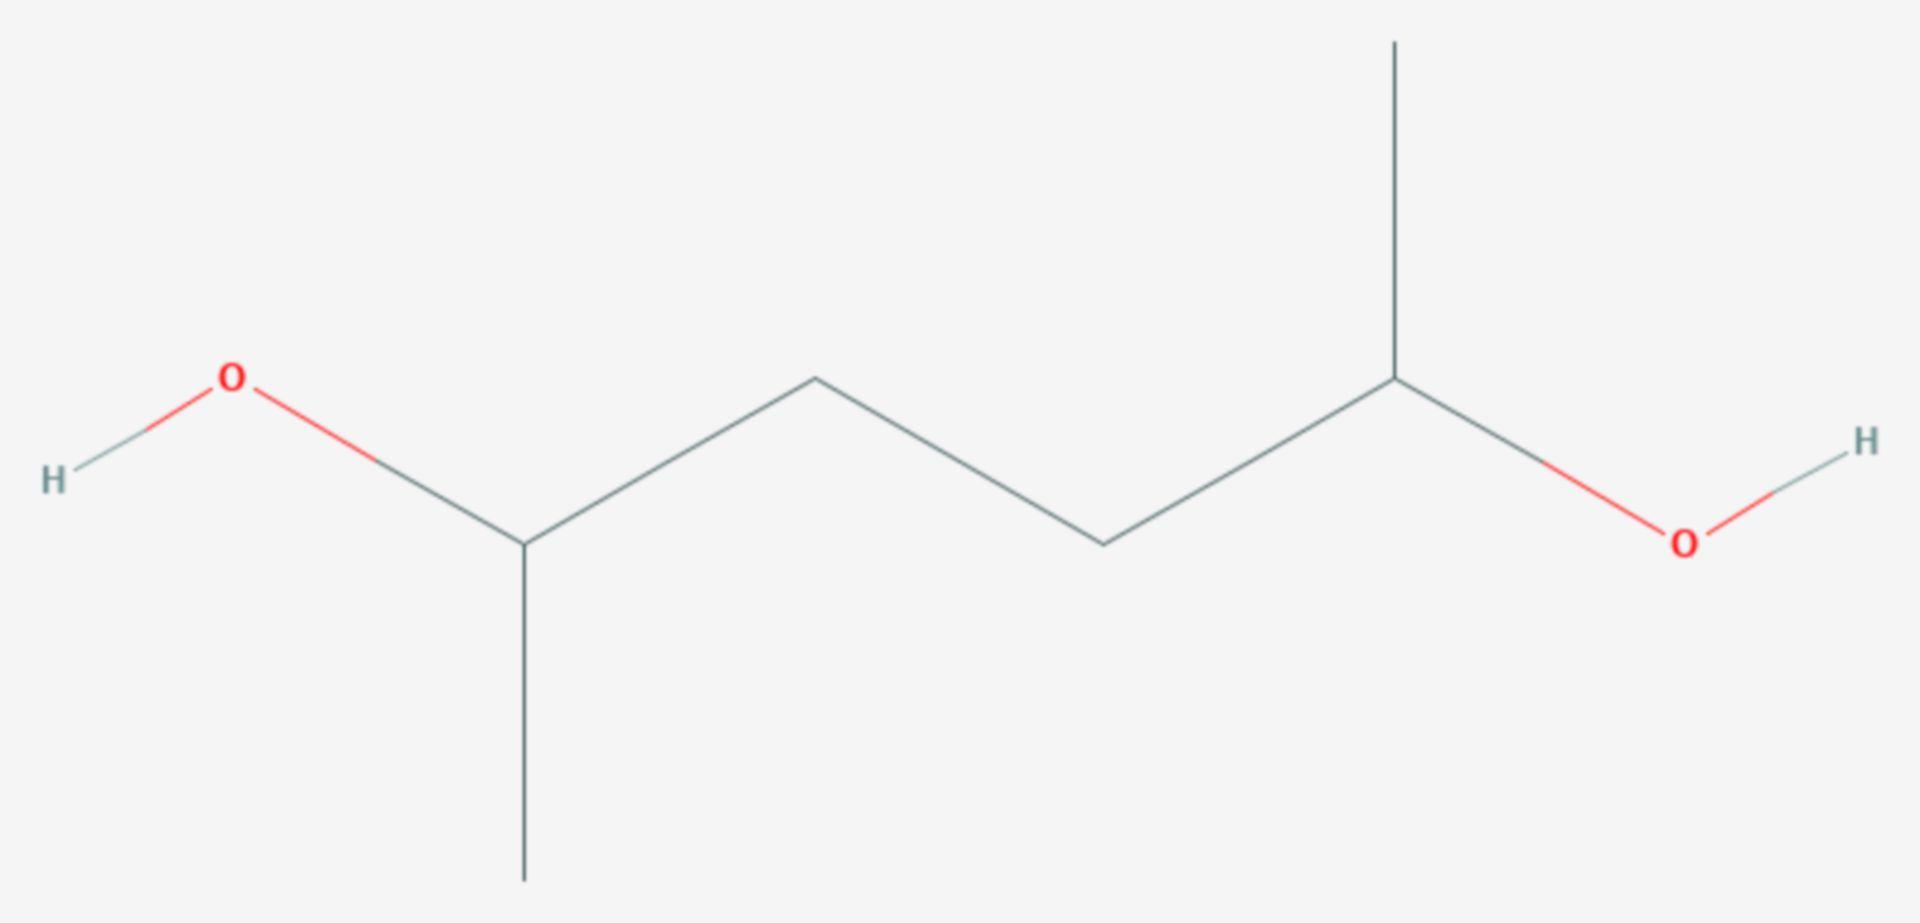 2,5-Hexandiol (Strukturformel)